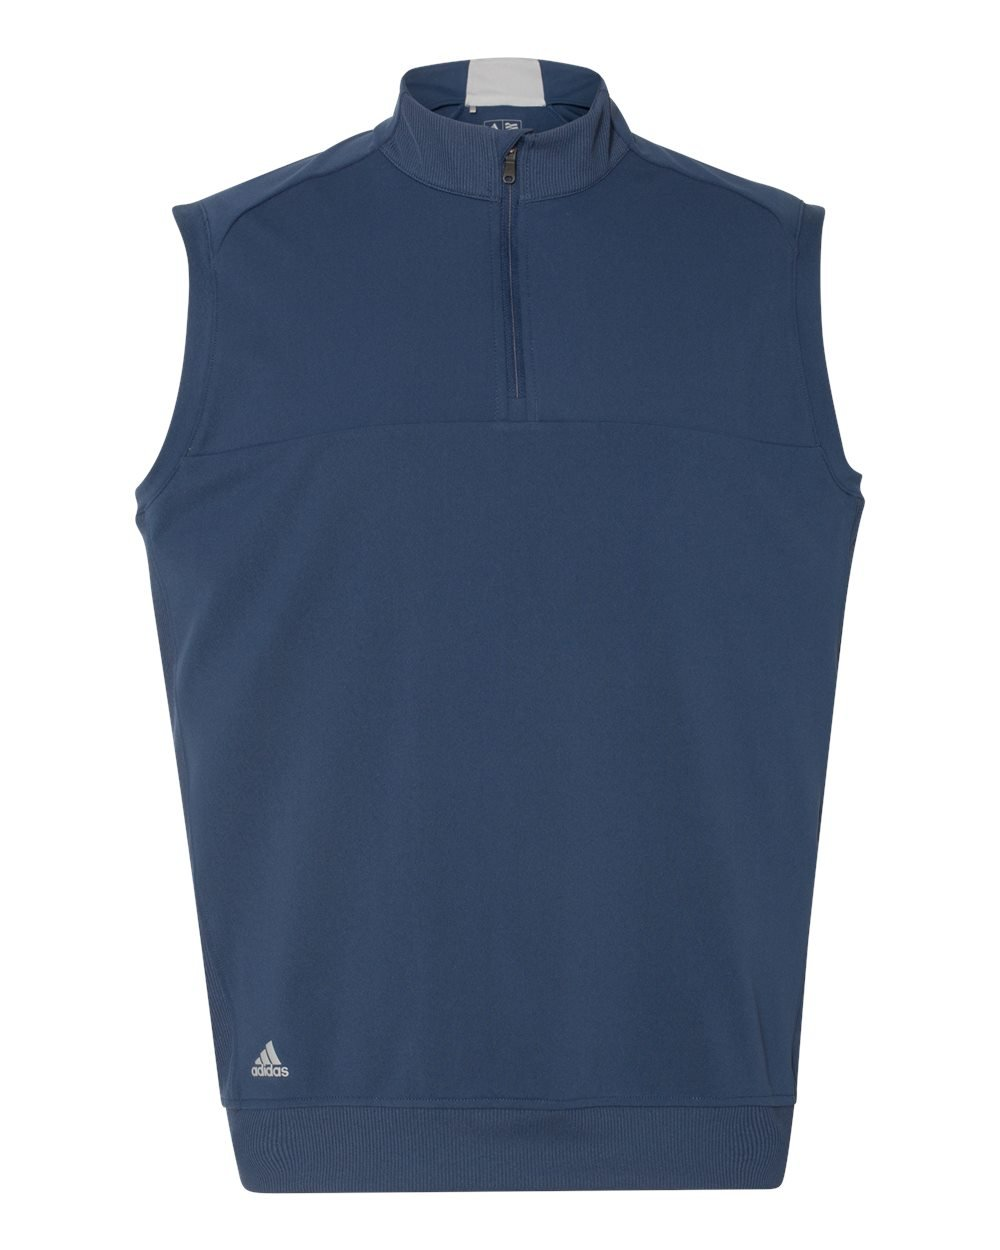 adidas Golf Mens Quarter-Zip Club Vest (A271) -Dark Slate -L